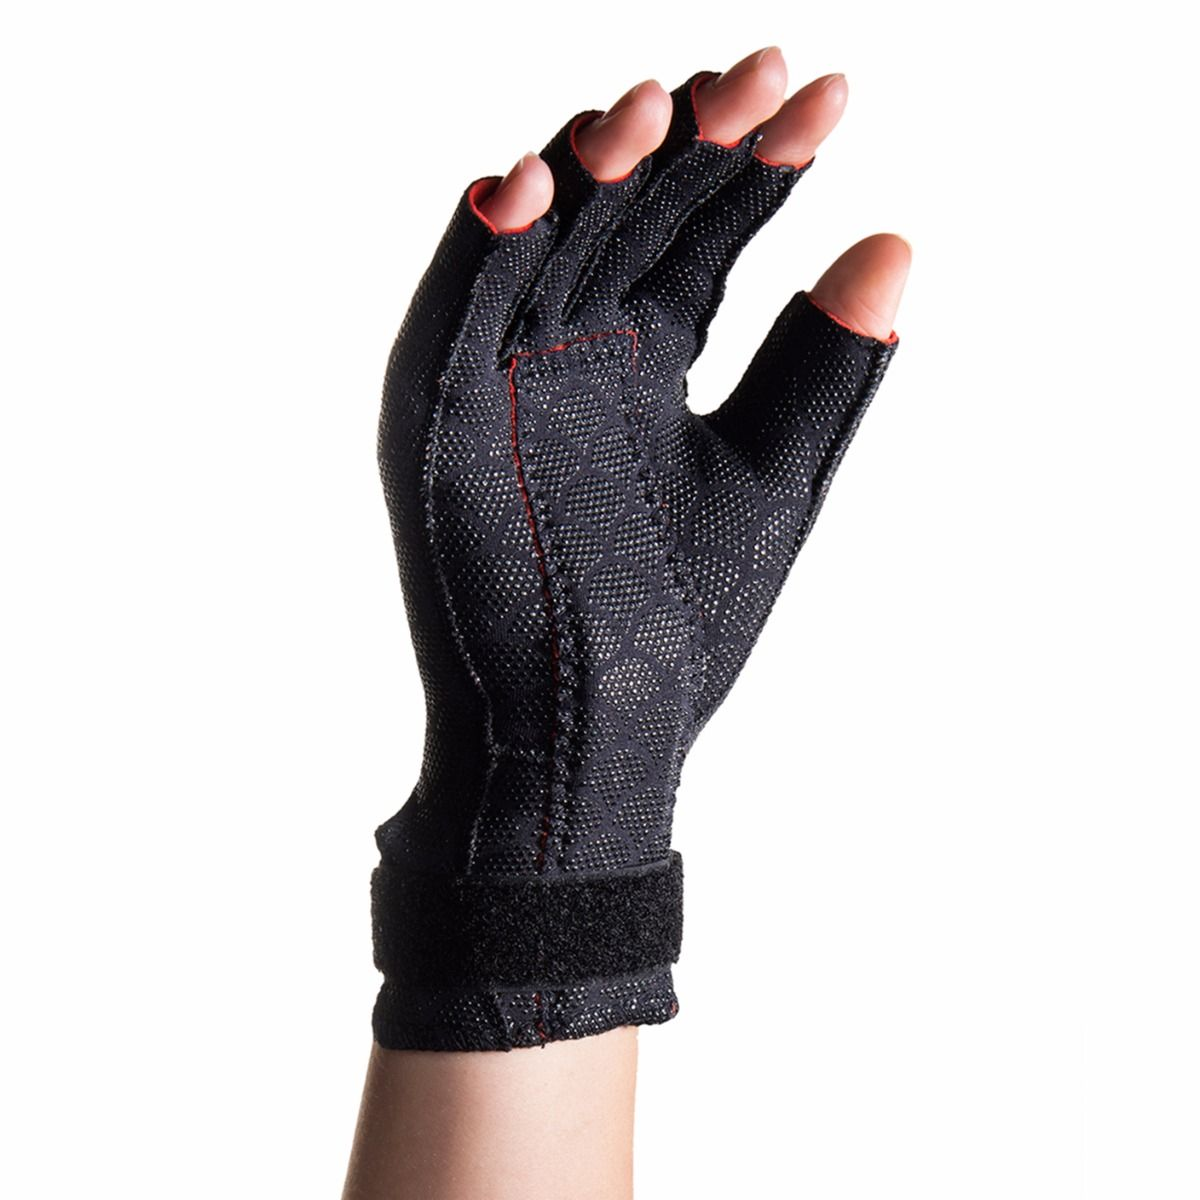 Thermoskin Carpal Tunnel Glove